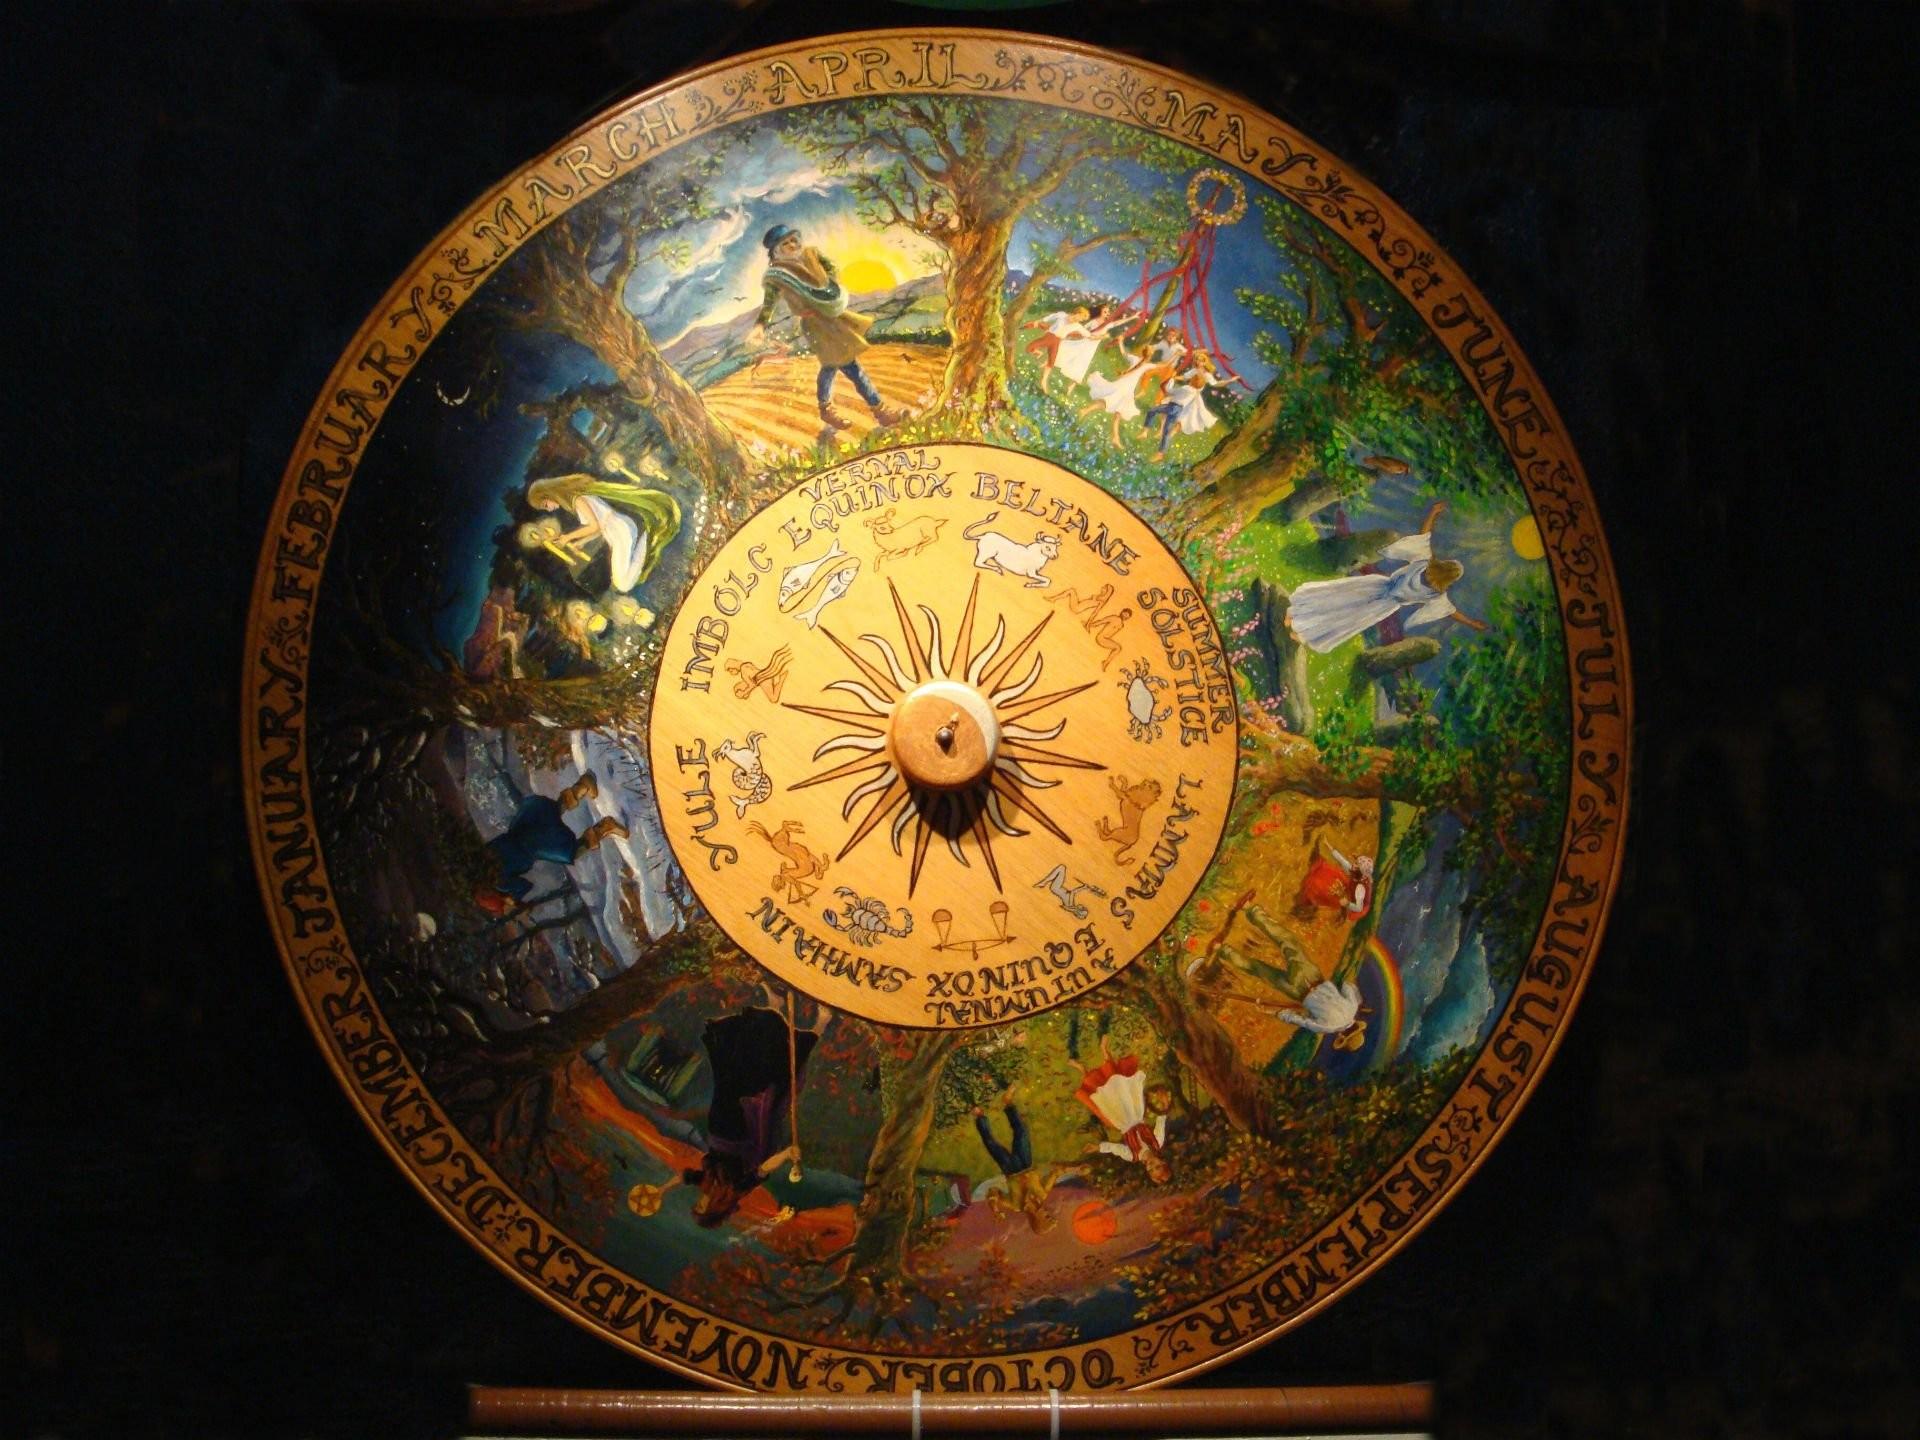 Art, Spooky Fantasy, Halloween, Artwork, Horror, Abstract - Wheel Of The Year Druid - HD Wallpaper